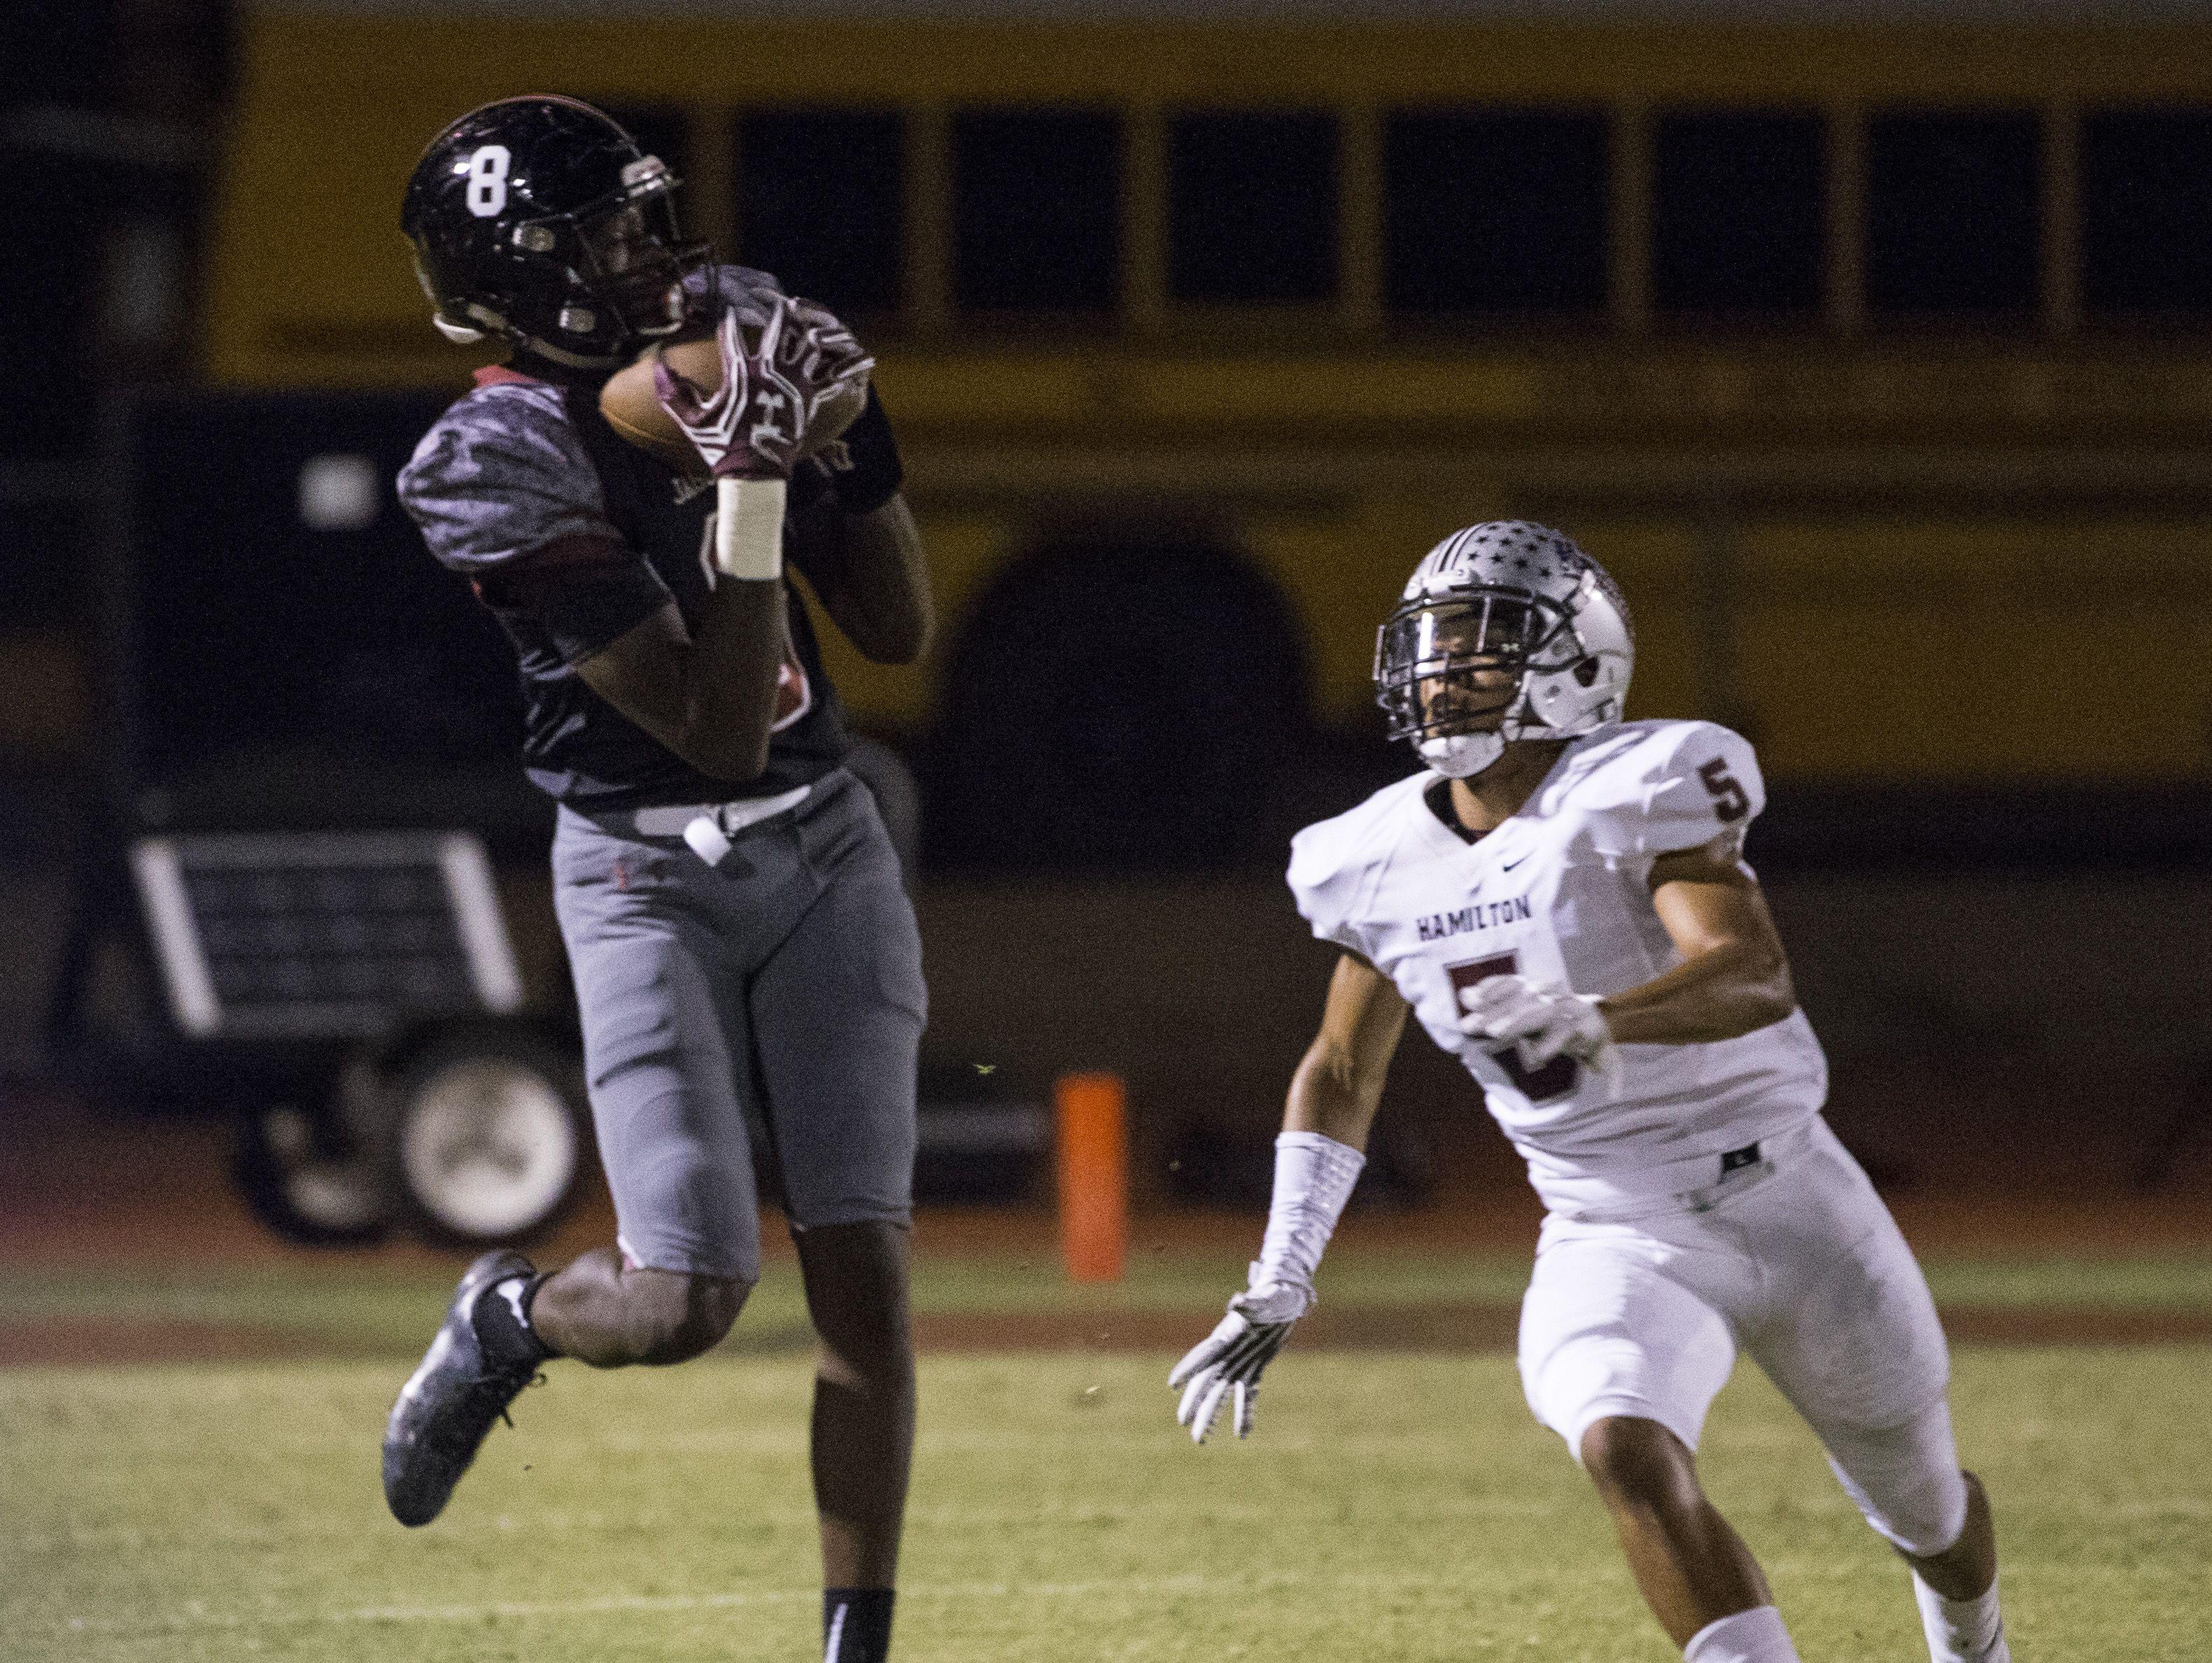 Desert Ridge's Jalen Harris (8) makes a catch over Hamilton's Ezekiel Robbins (5) in the first half at Desert Ridge High School on September 9, 2016 in Mesa, Ariz.